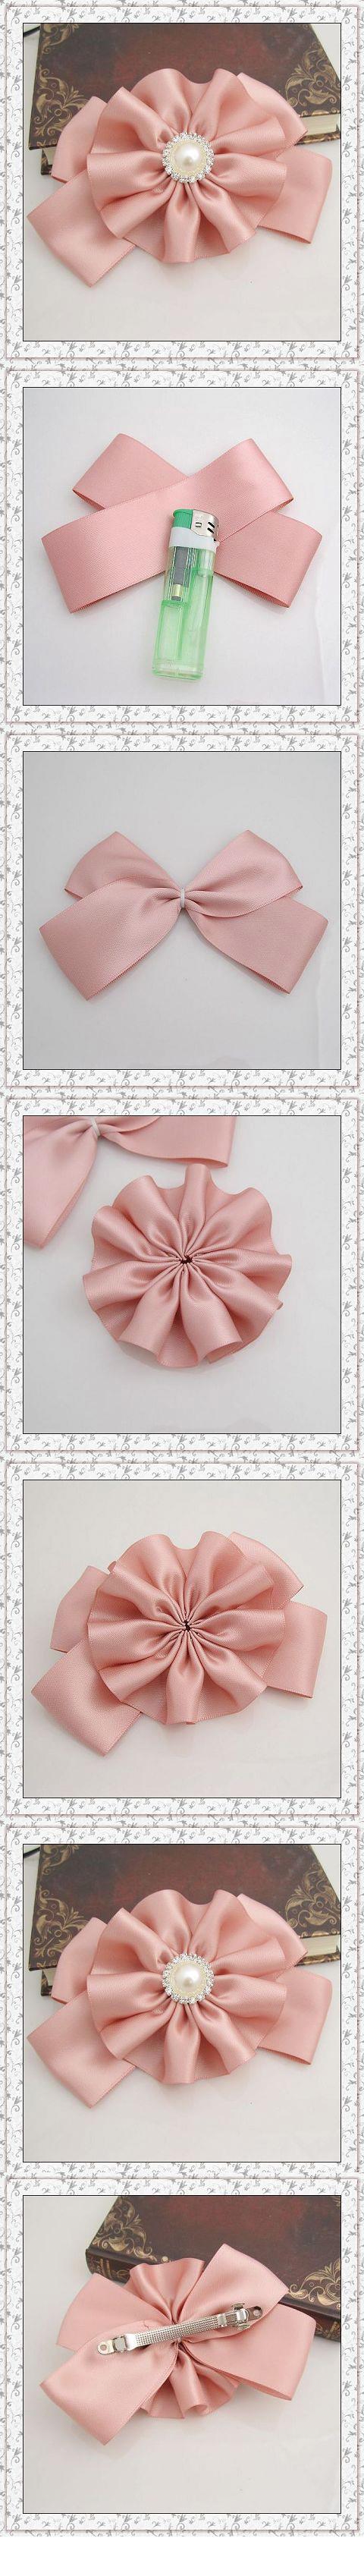 Handmade bow tutorial